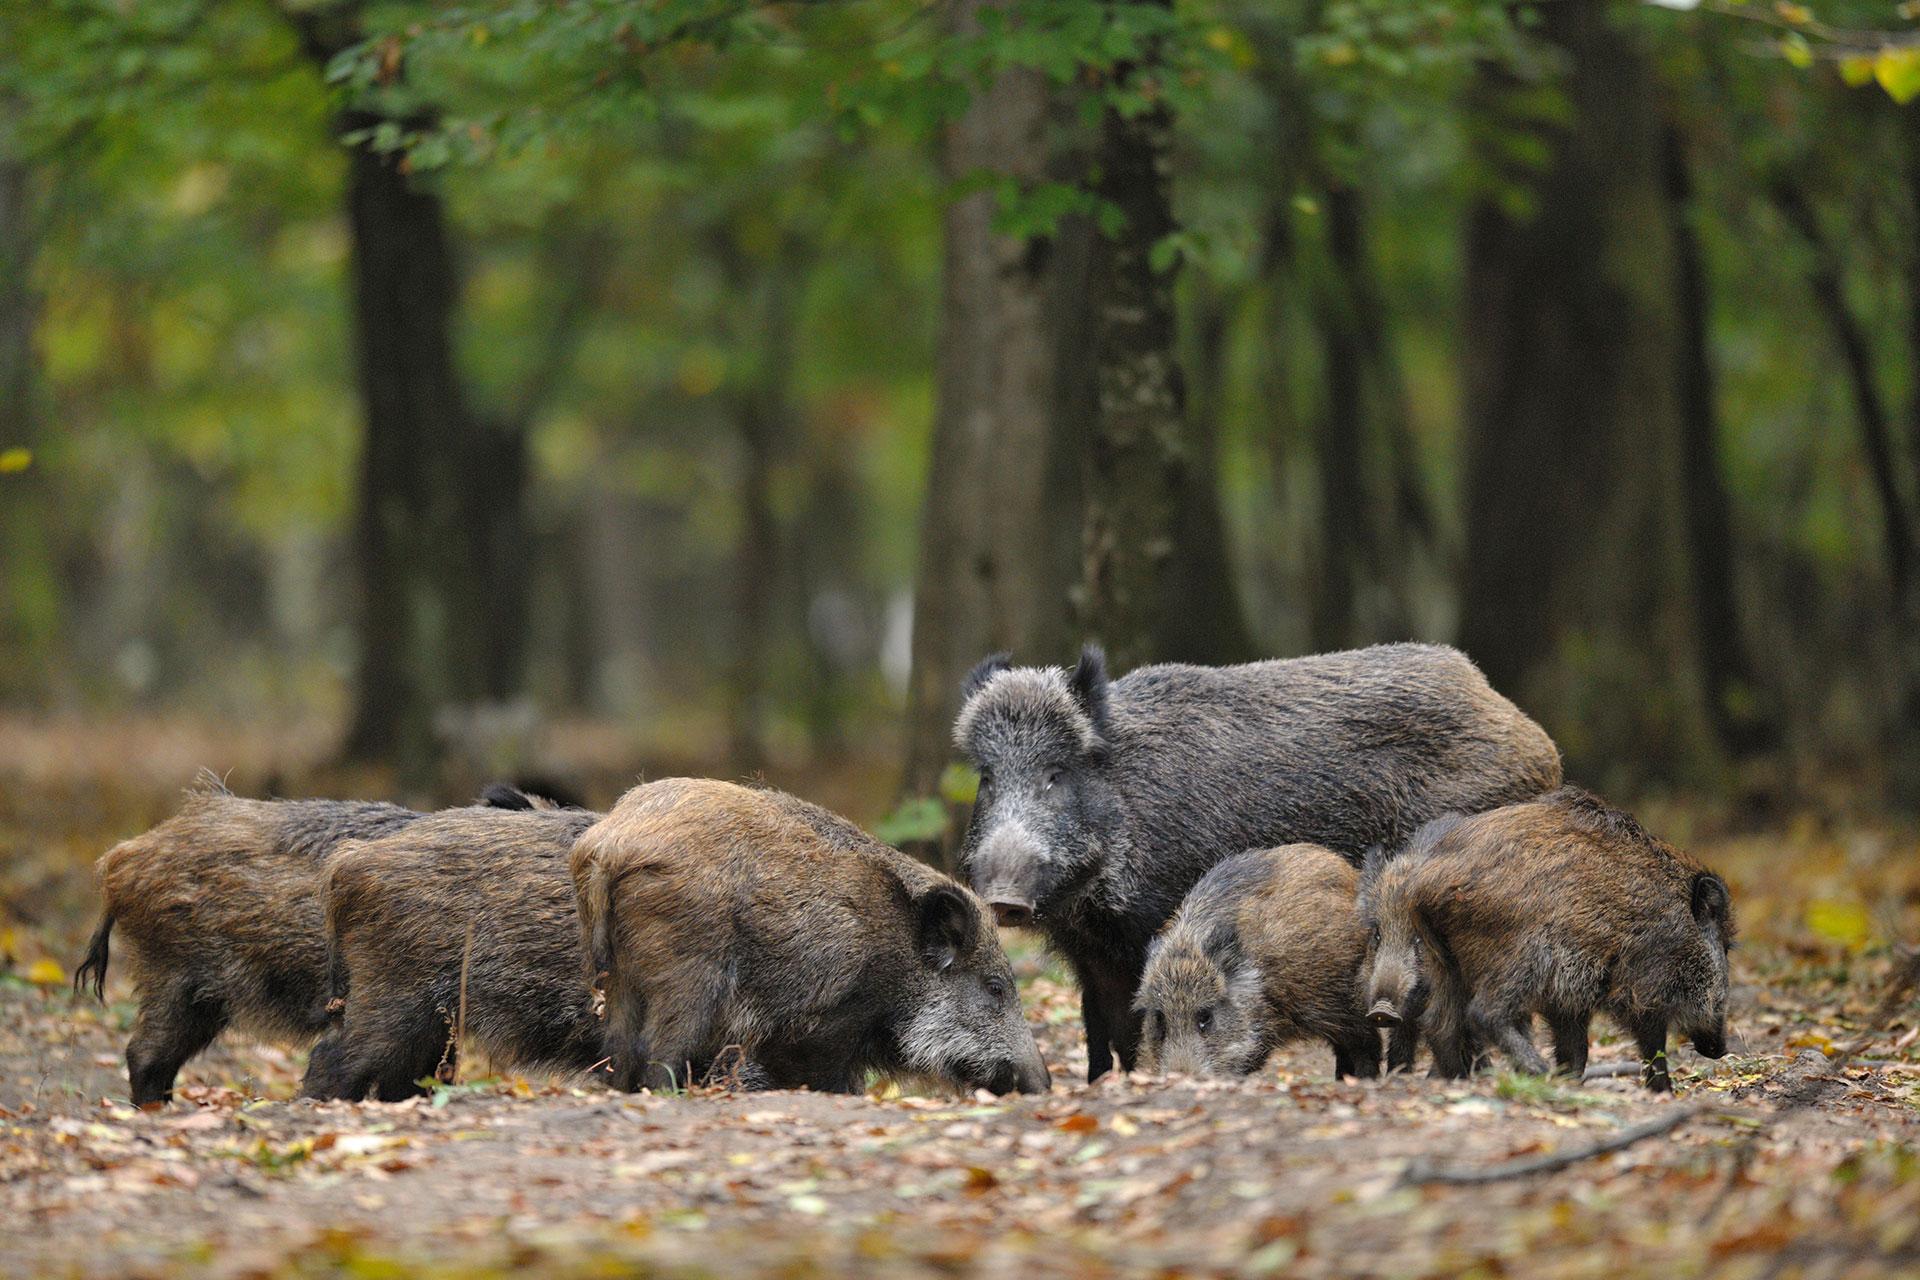 Wildoekologie Artenschutz Naturbildung